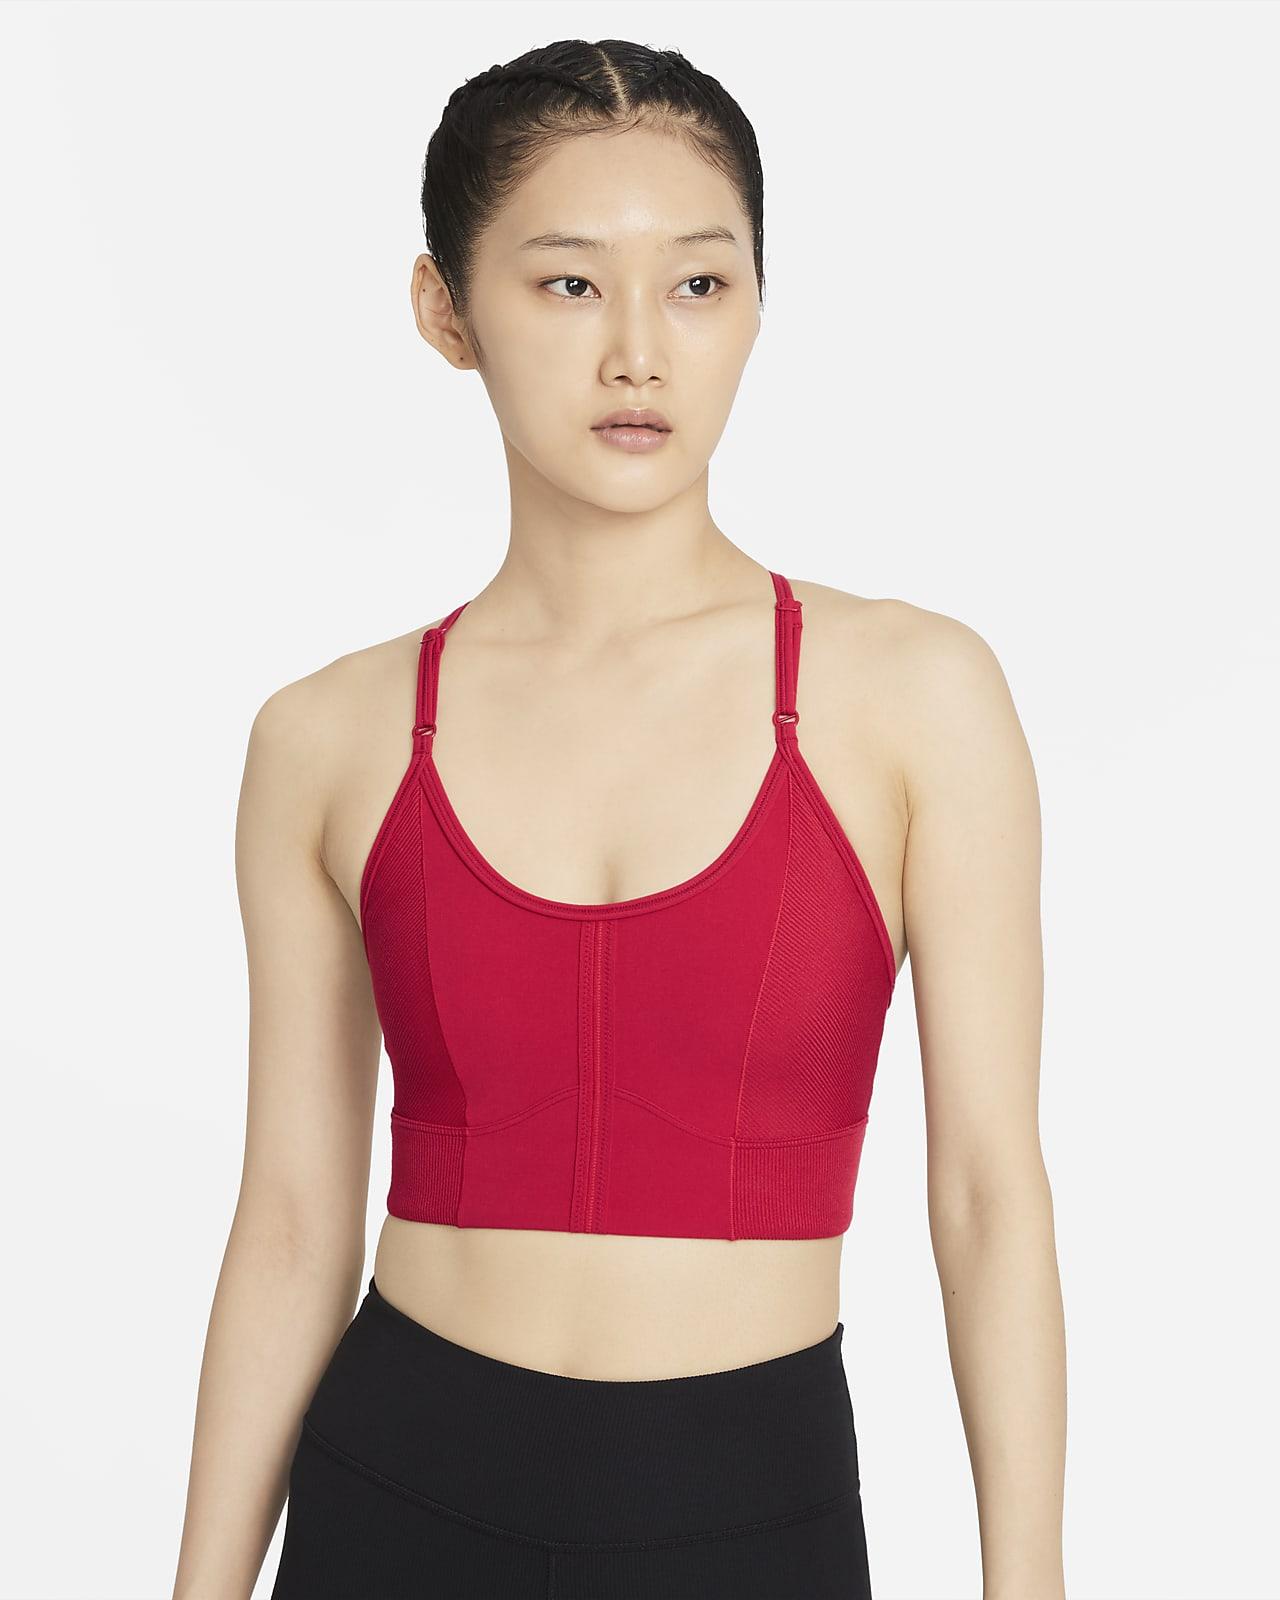 Nike Yoga Dri-FIT Indy Women's Light-Support Padded Longline Sports Bra